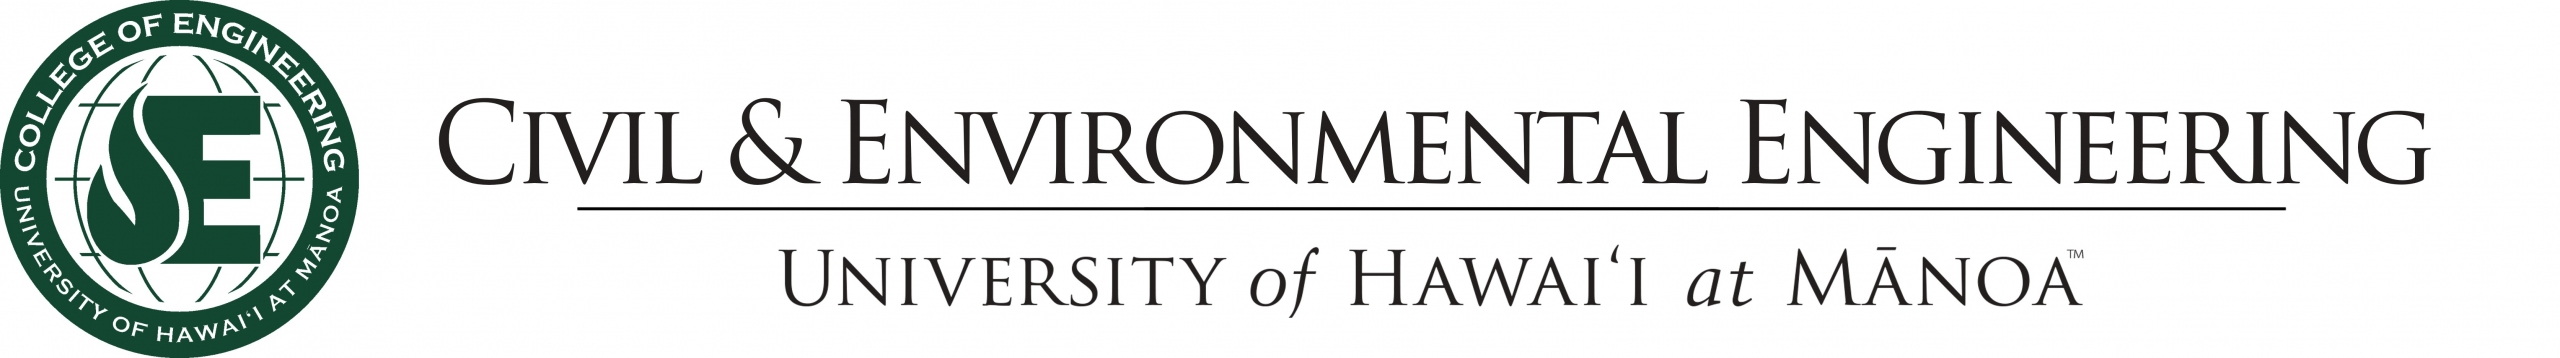 Civil & Environmental Engineering Department- University of Hawaii at Manoa